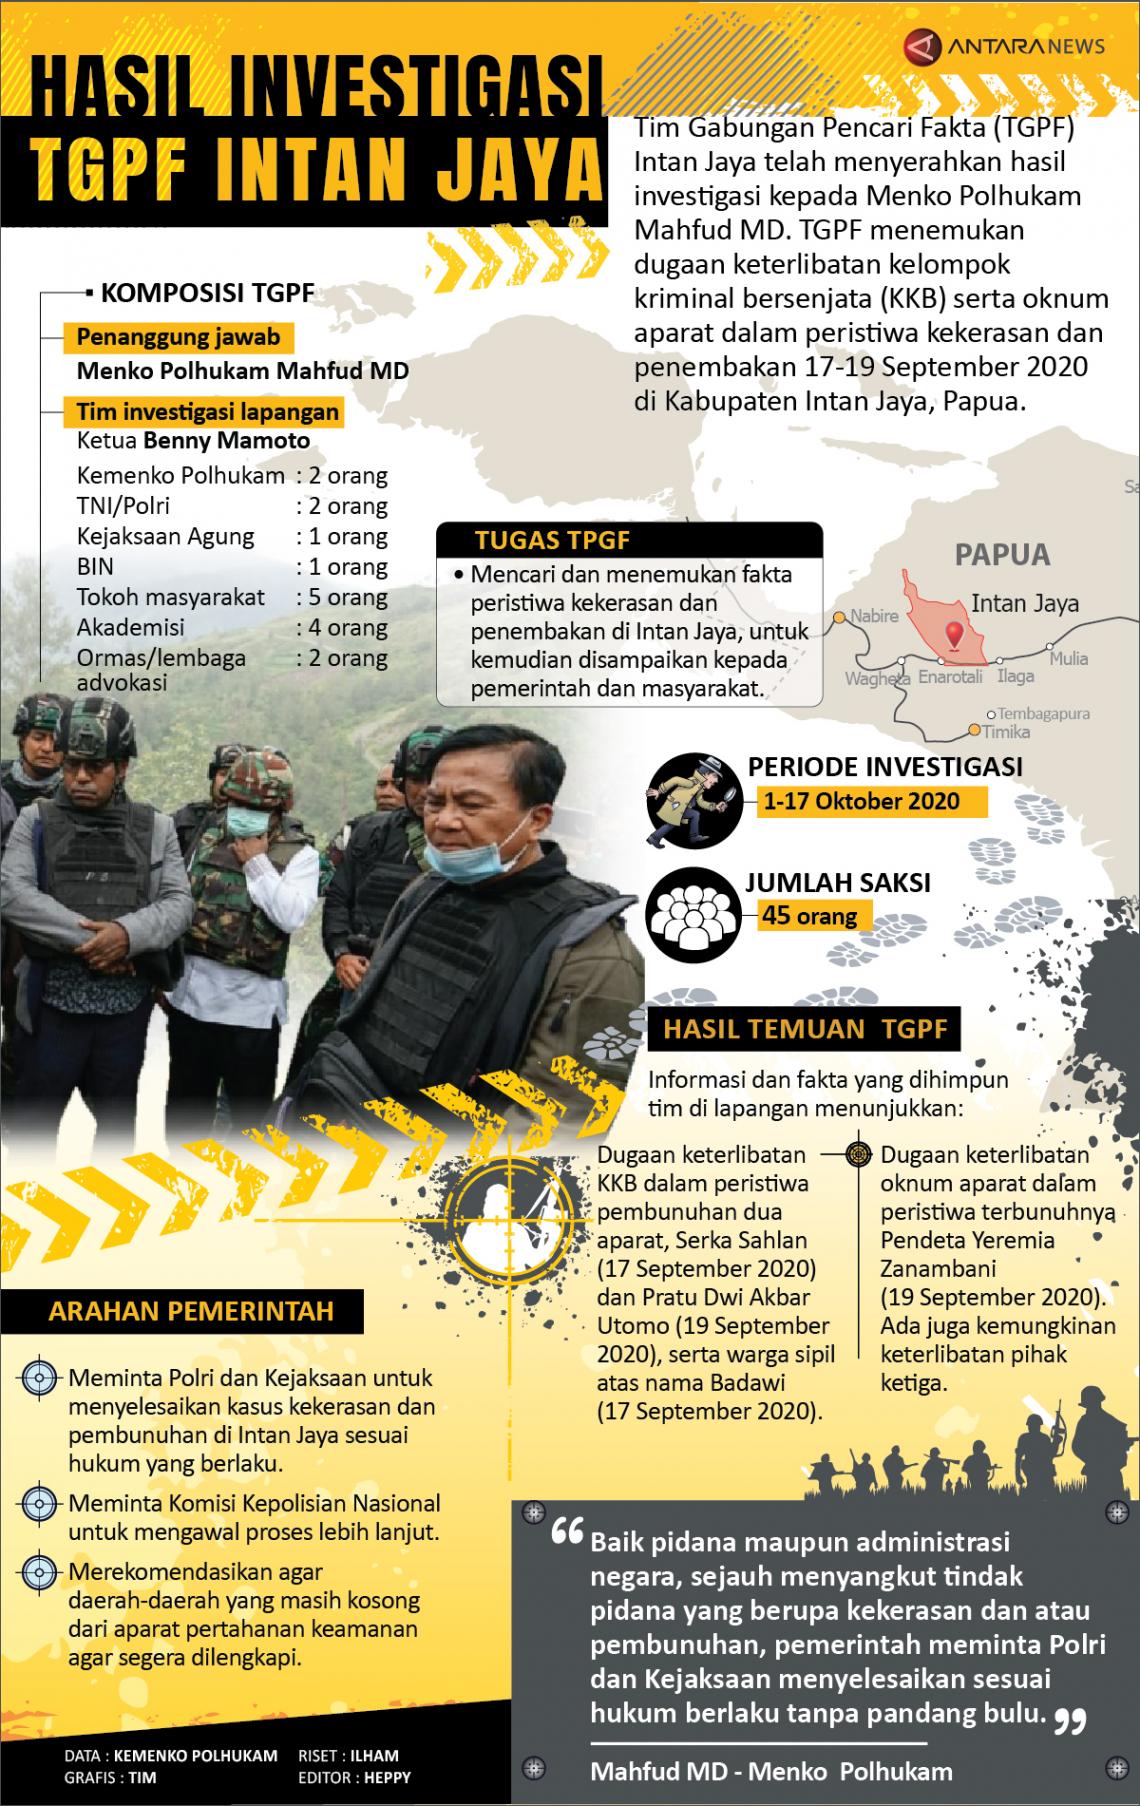 Hasil investigasi TGPF Intan Jaya